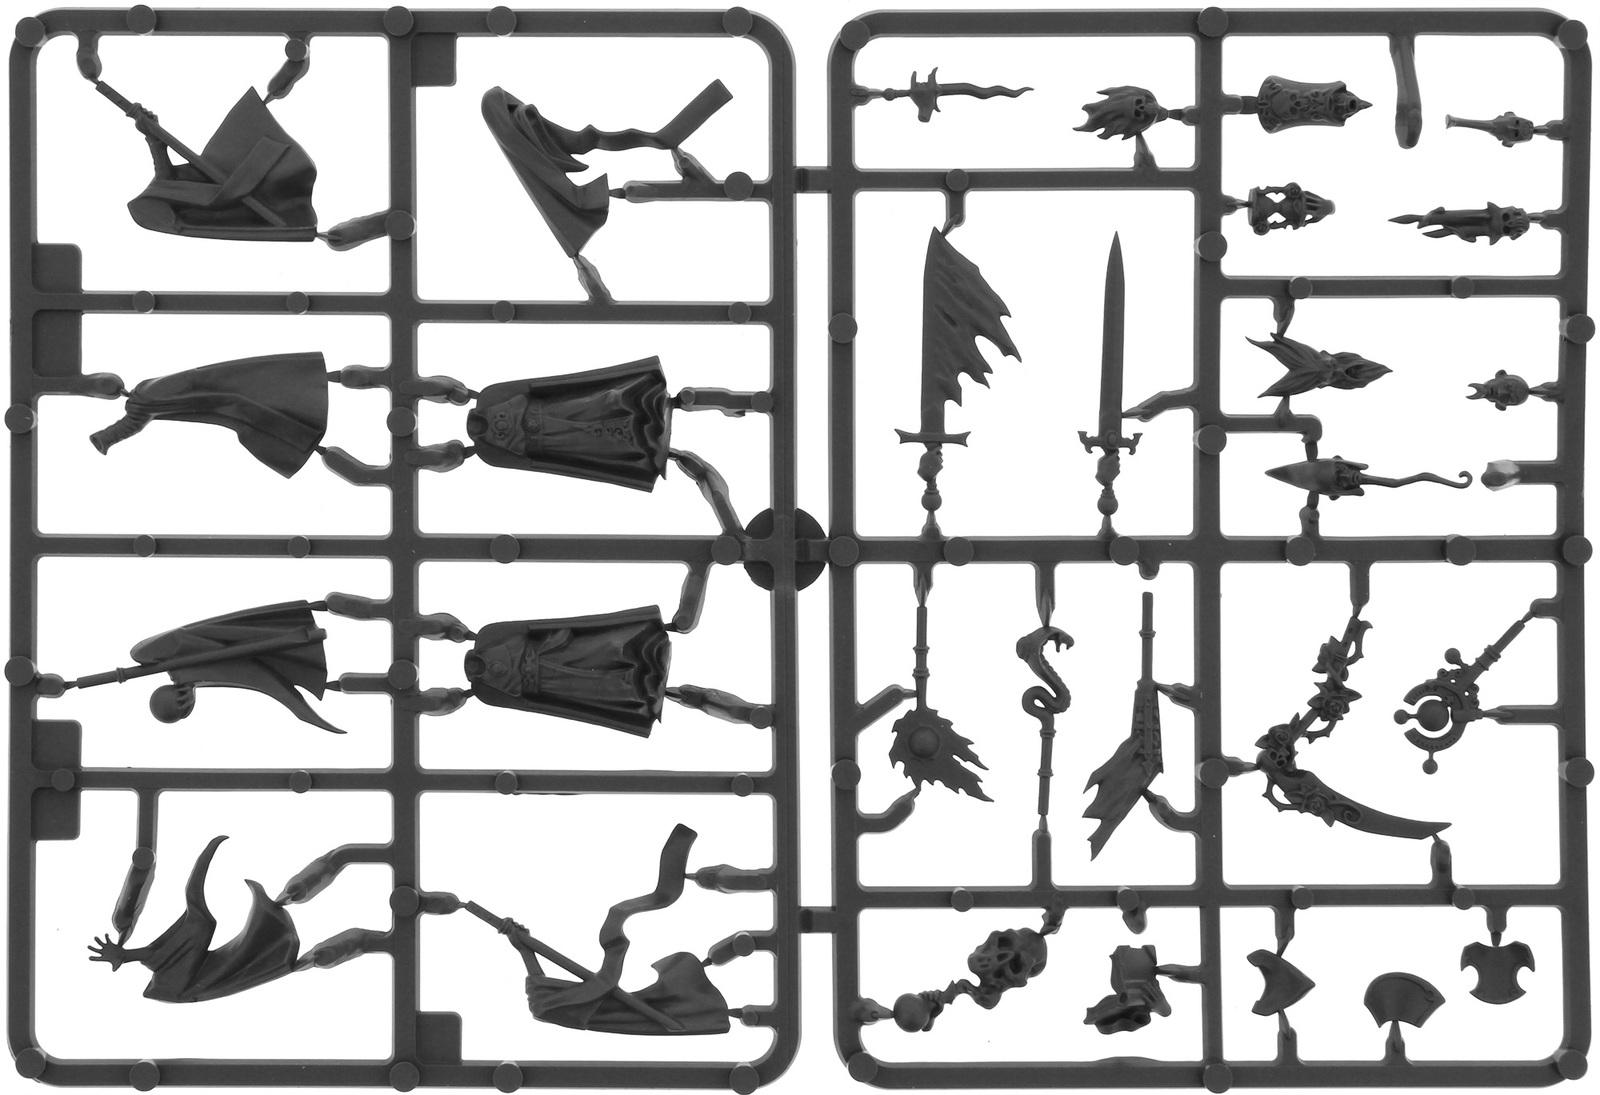 Warhammer Age of Sigmar: Collegiate Arcane Mystic Battle Wizards image